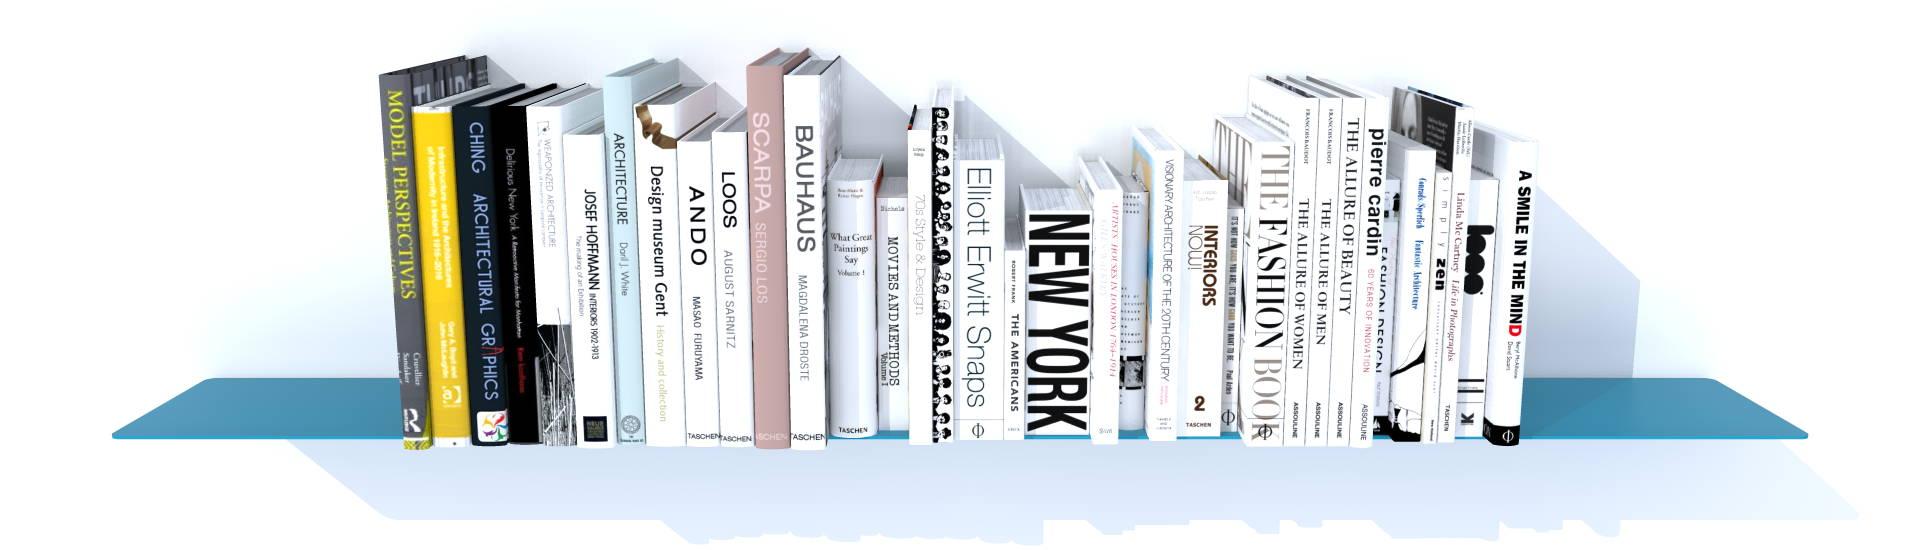 etagere grands livres